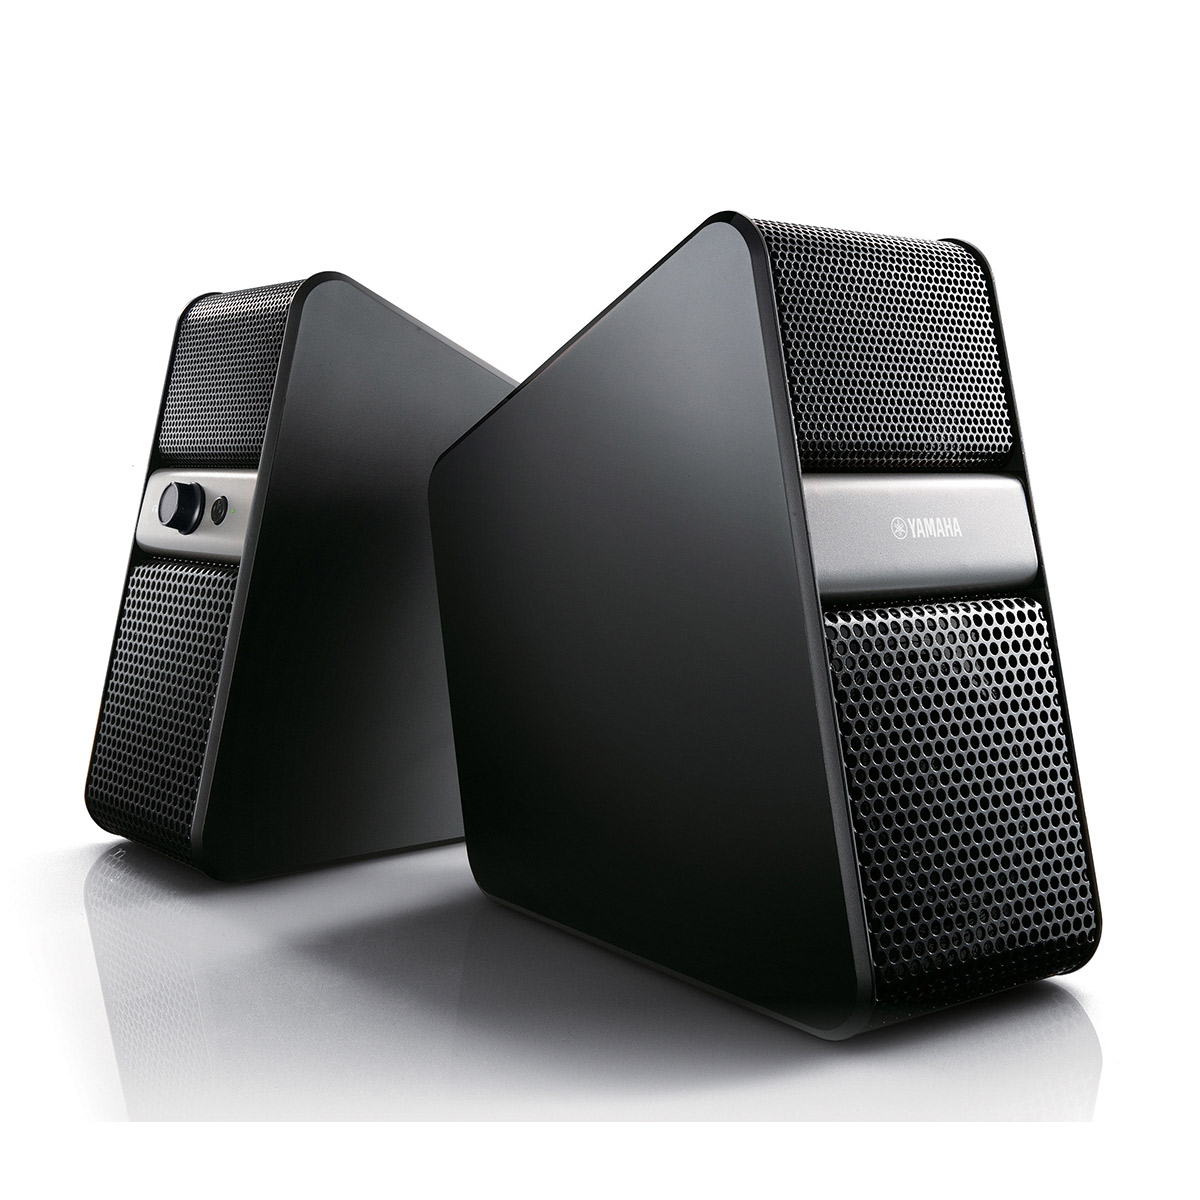 Dock & Enceinte Bluetooth Yamaha NX-B55 Titane Enceintes 2.0 sans fil Bluetooth